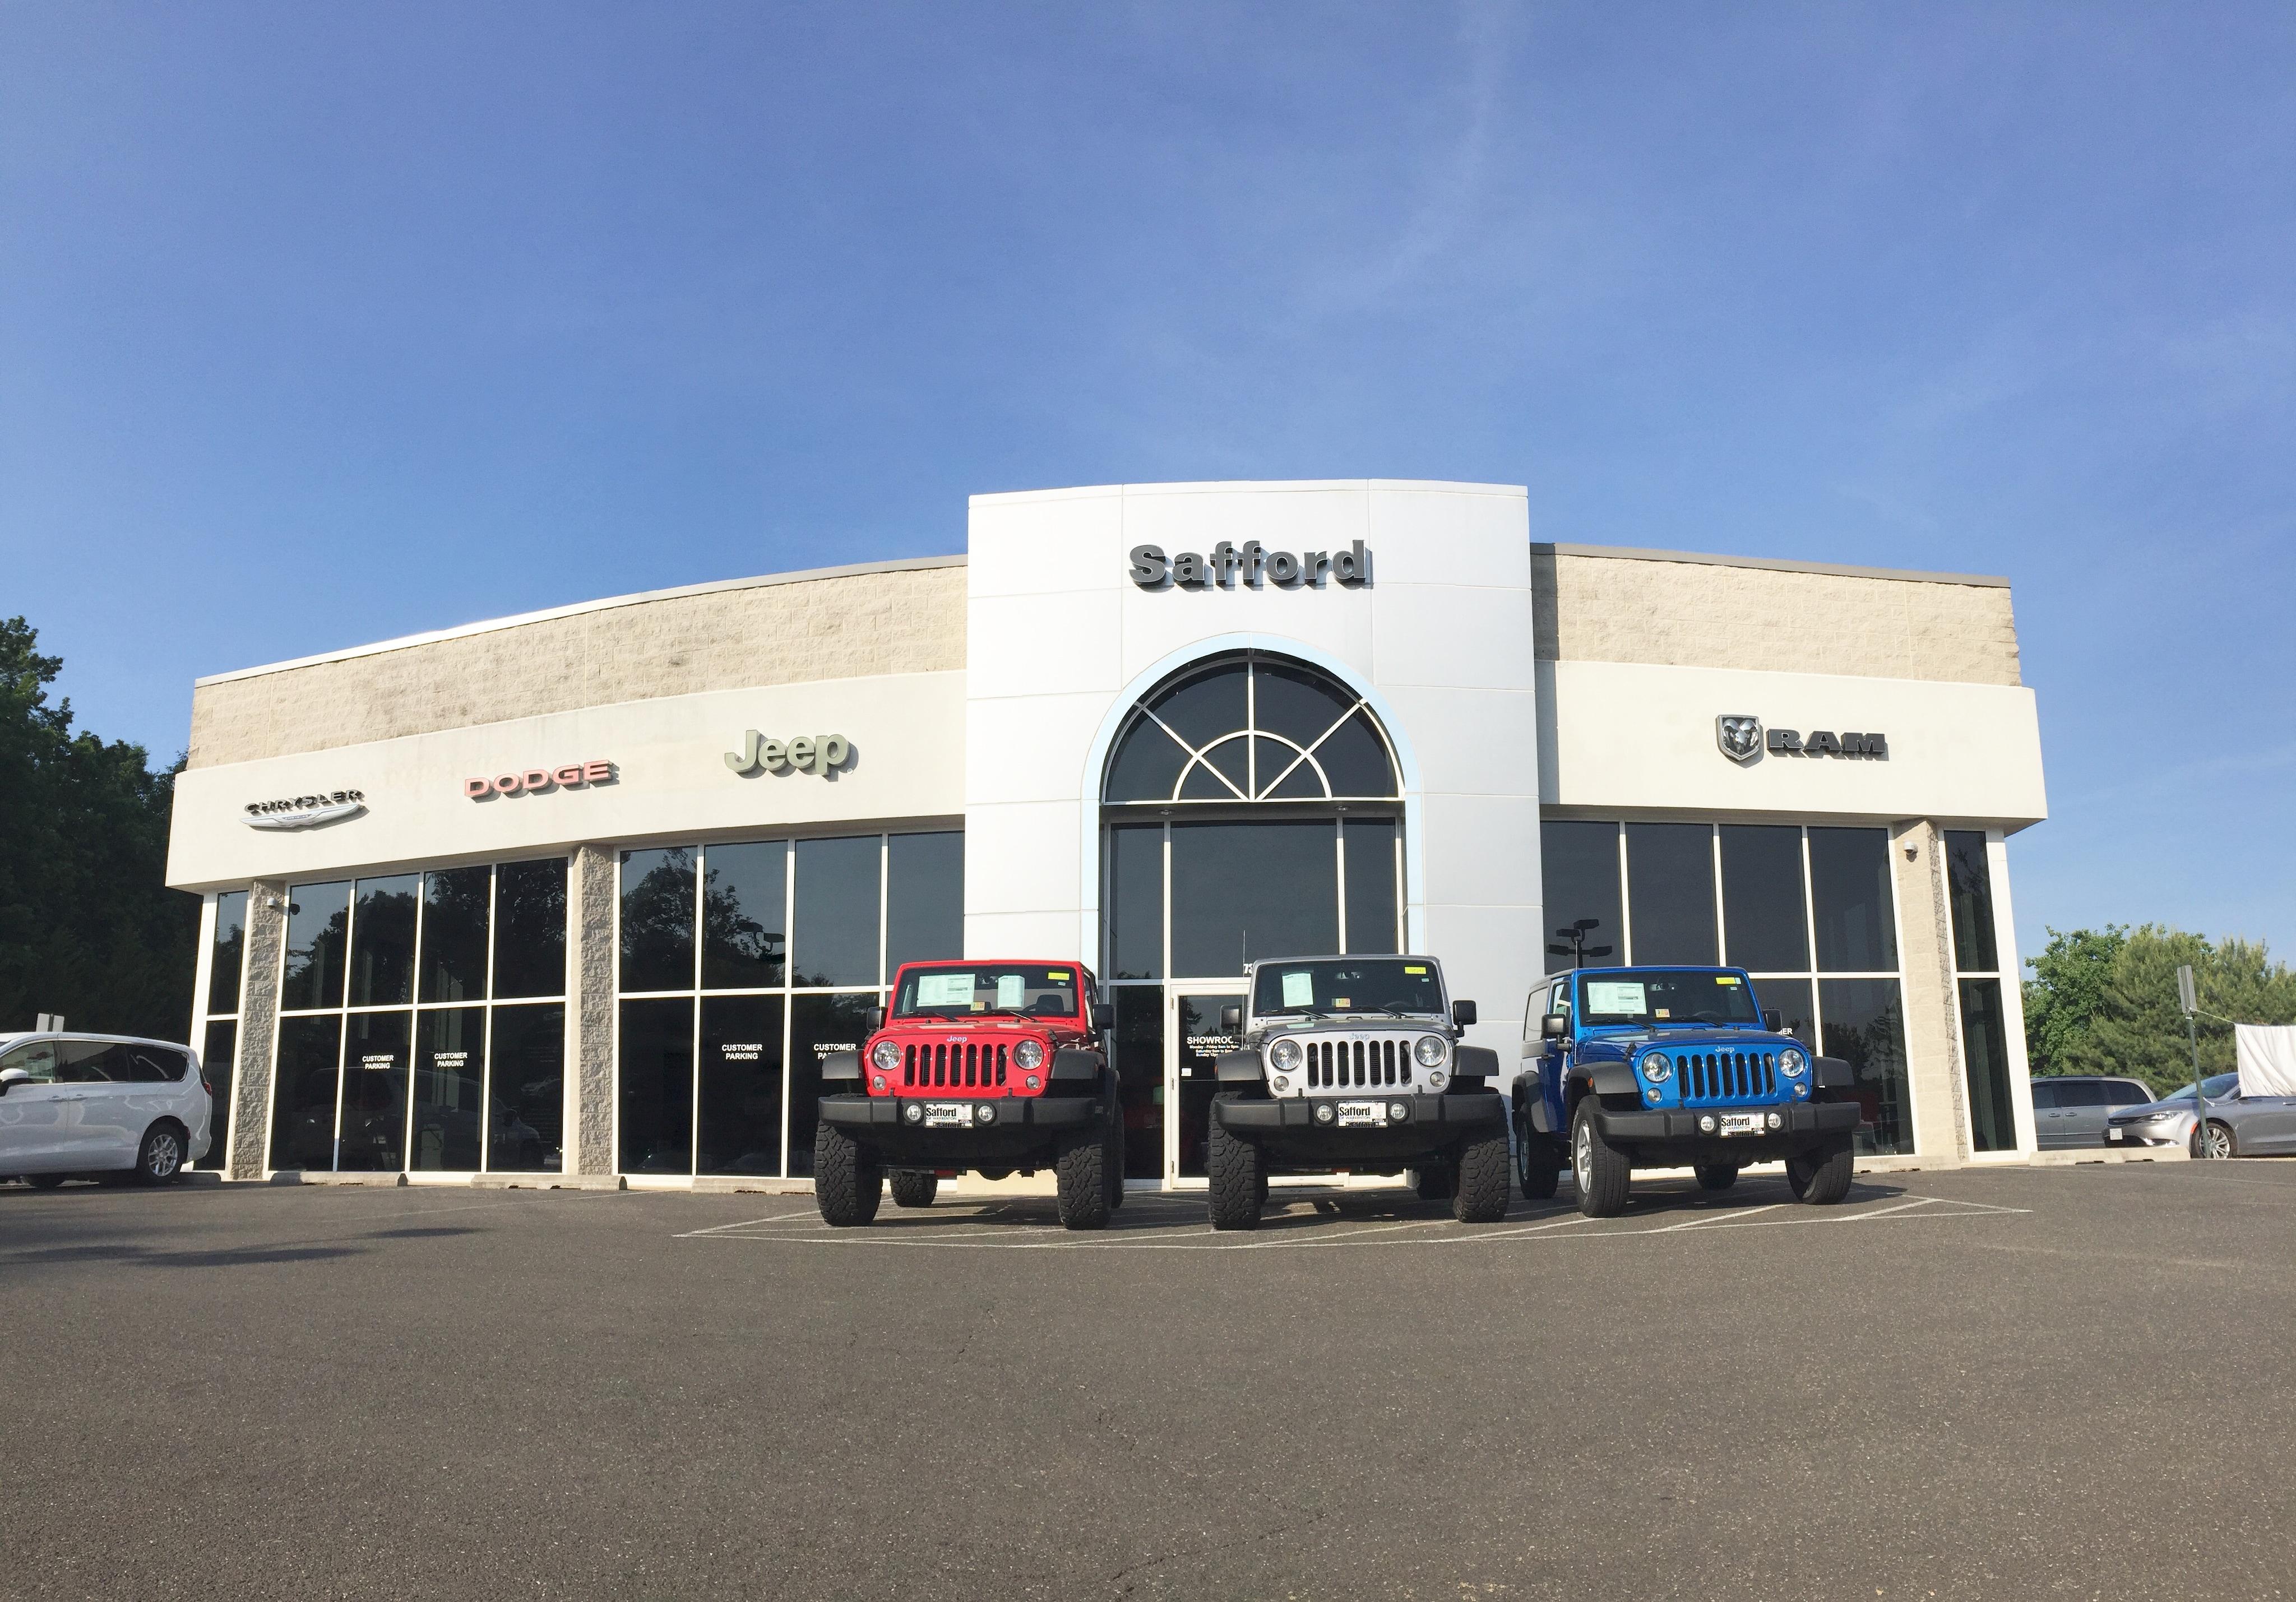 Safford Of Warrenton Va Jeep Chrysler Dodge Ram Dealership Virginia